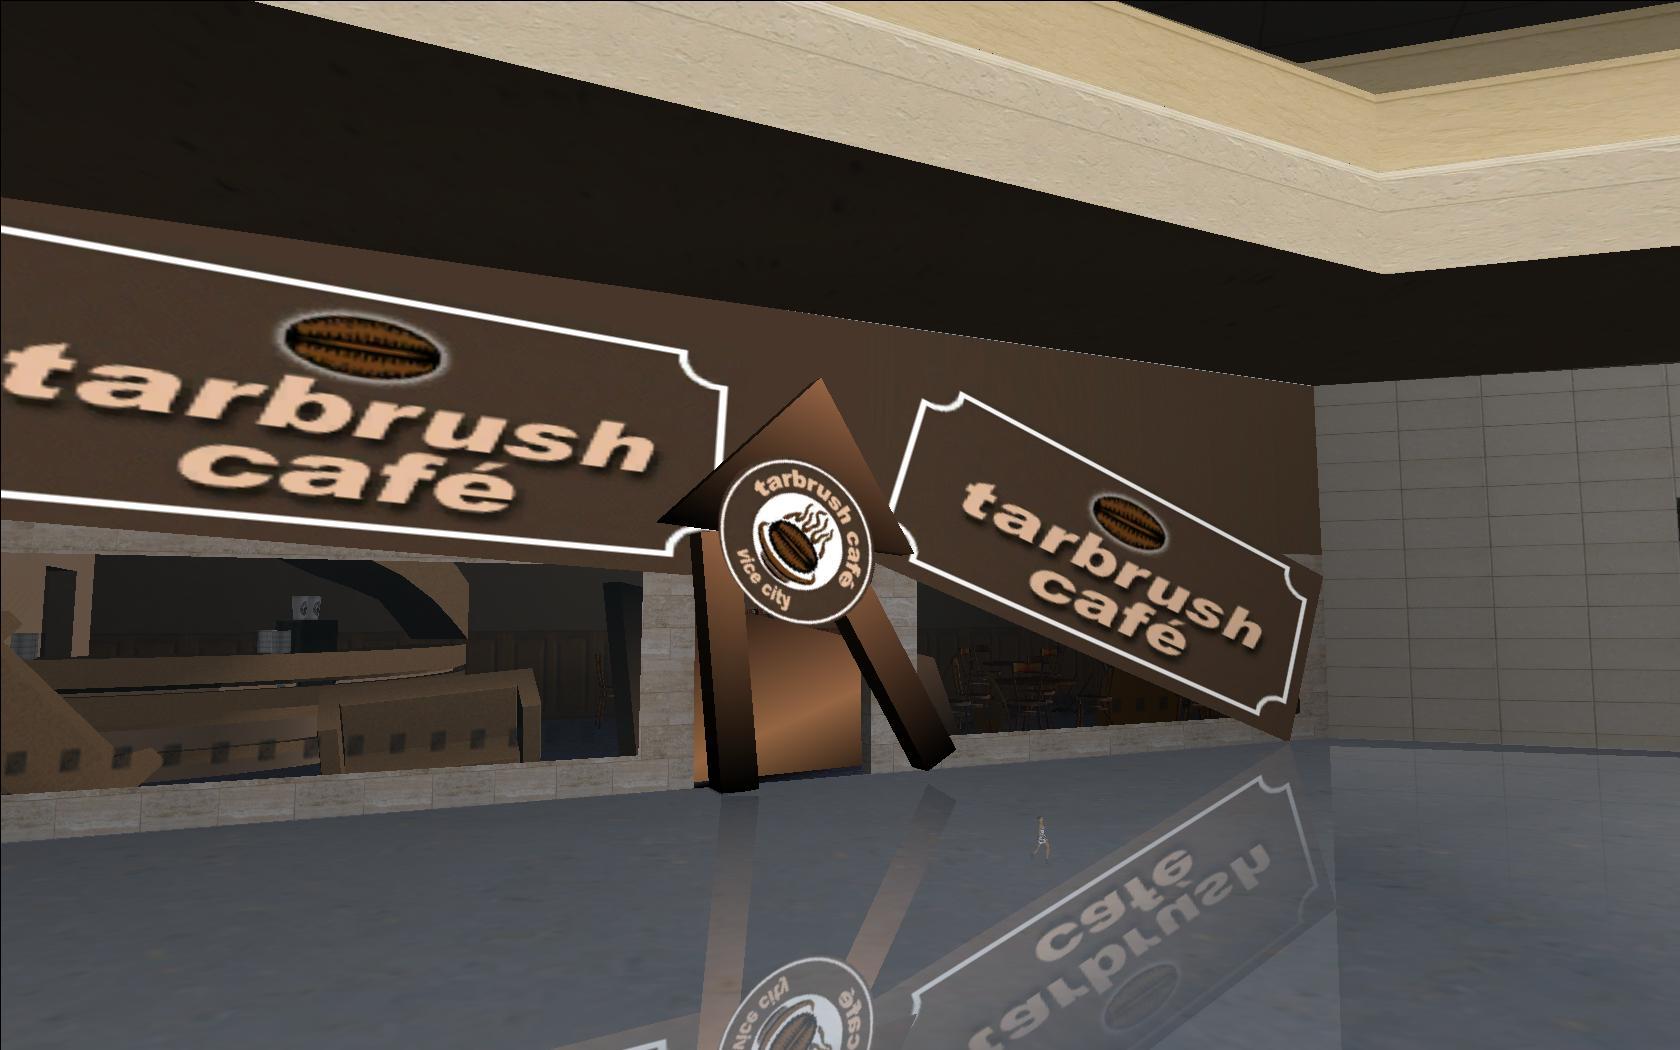 Tarbrush Cafe